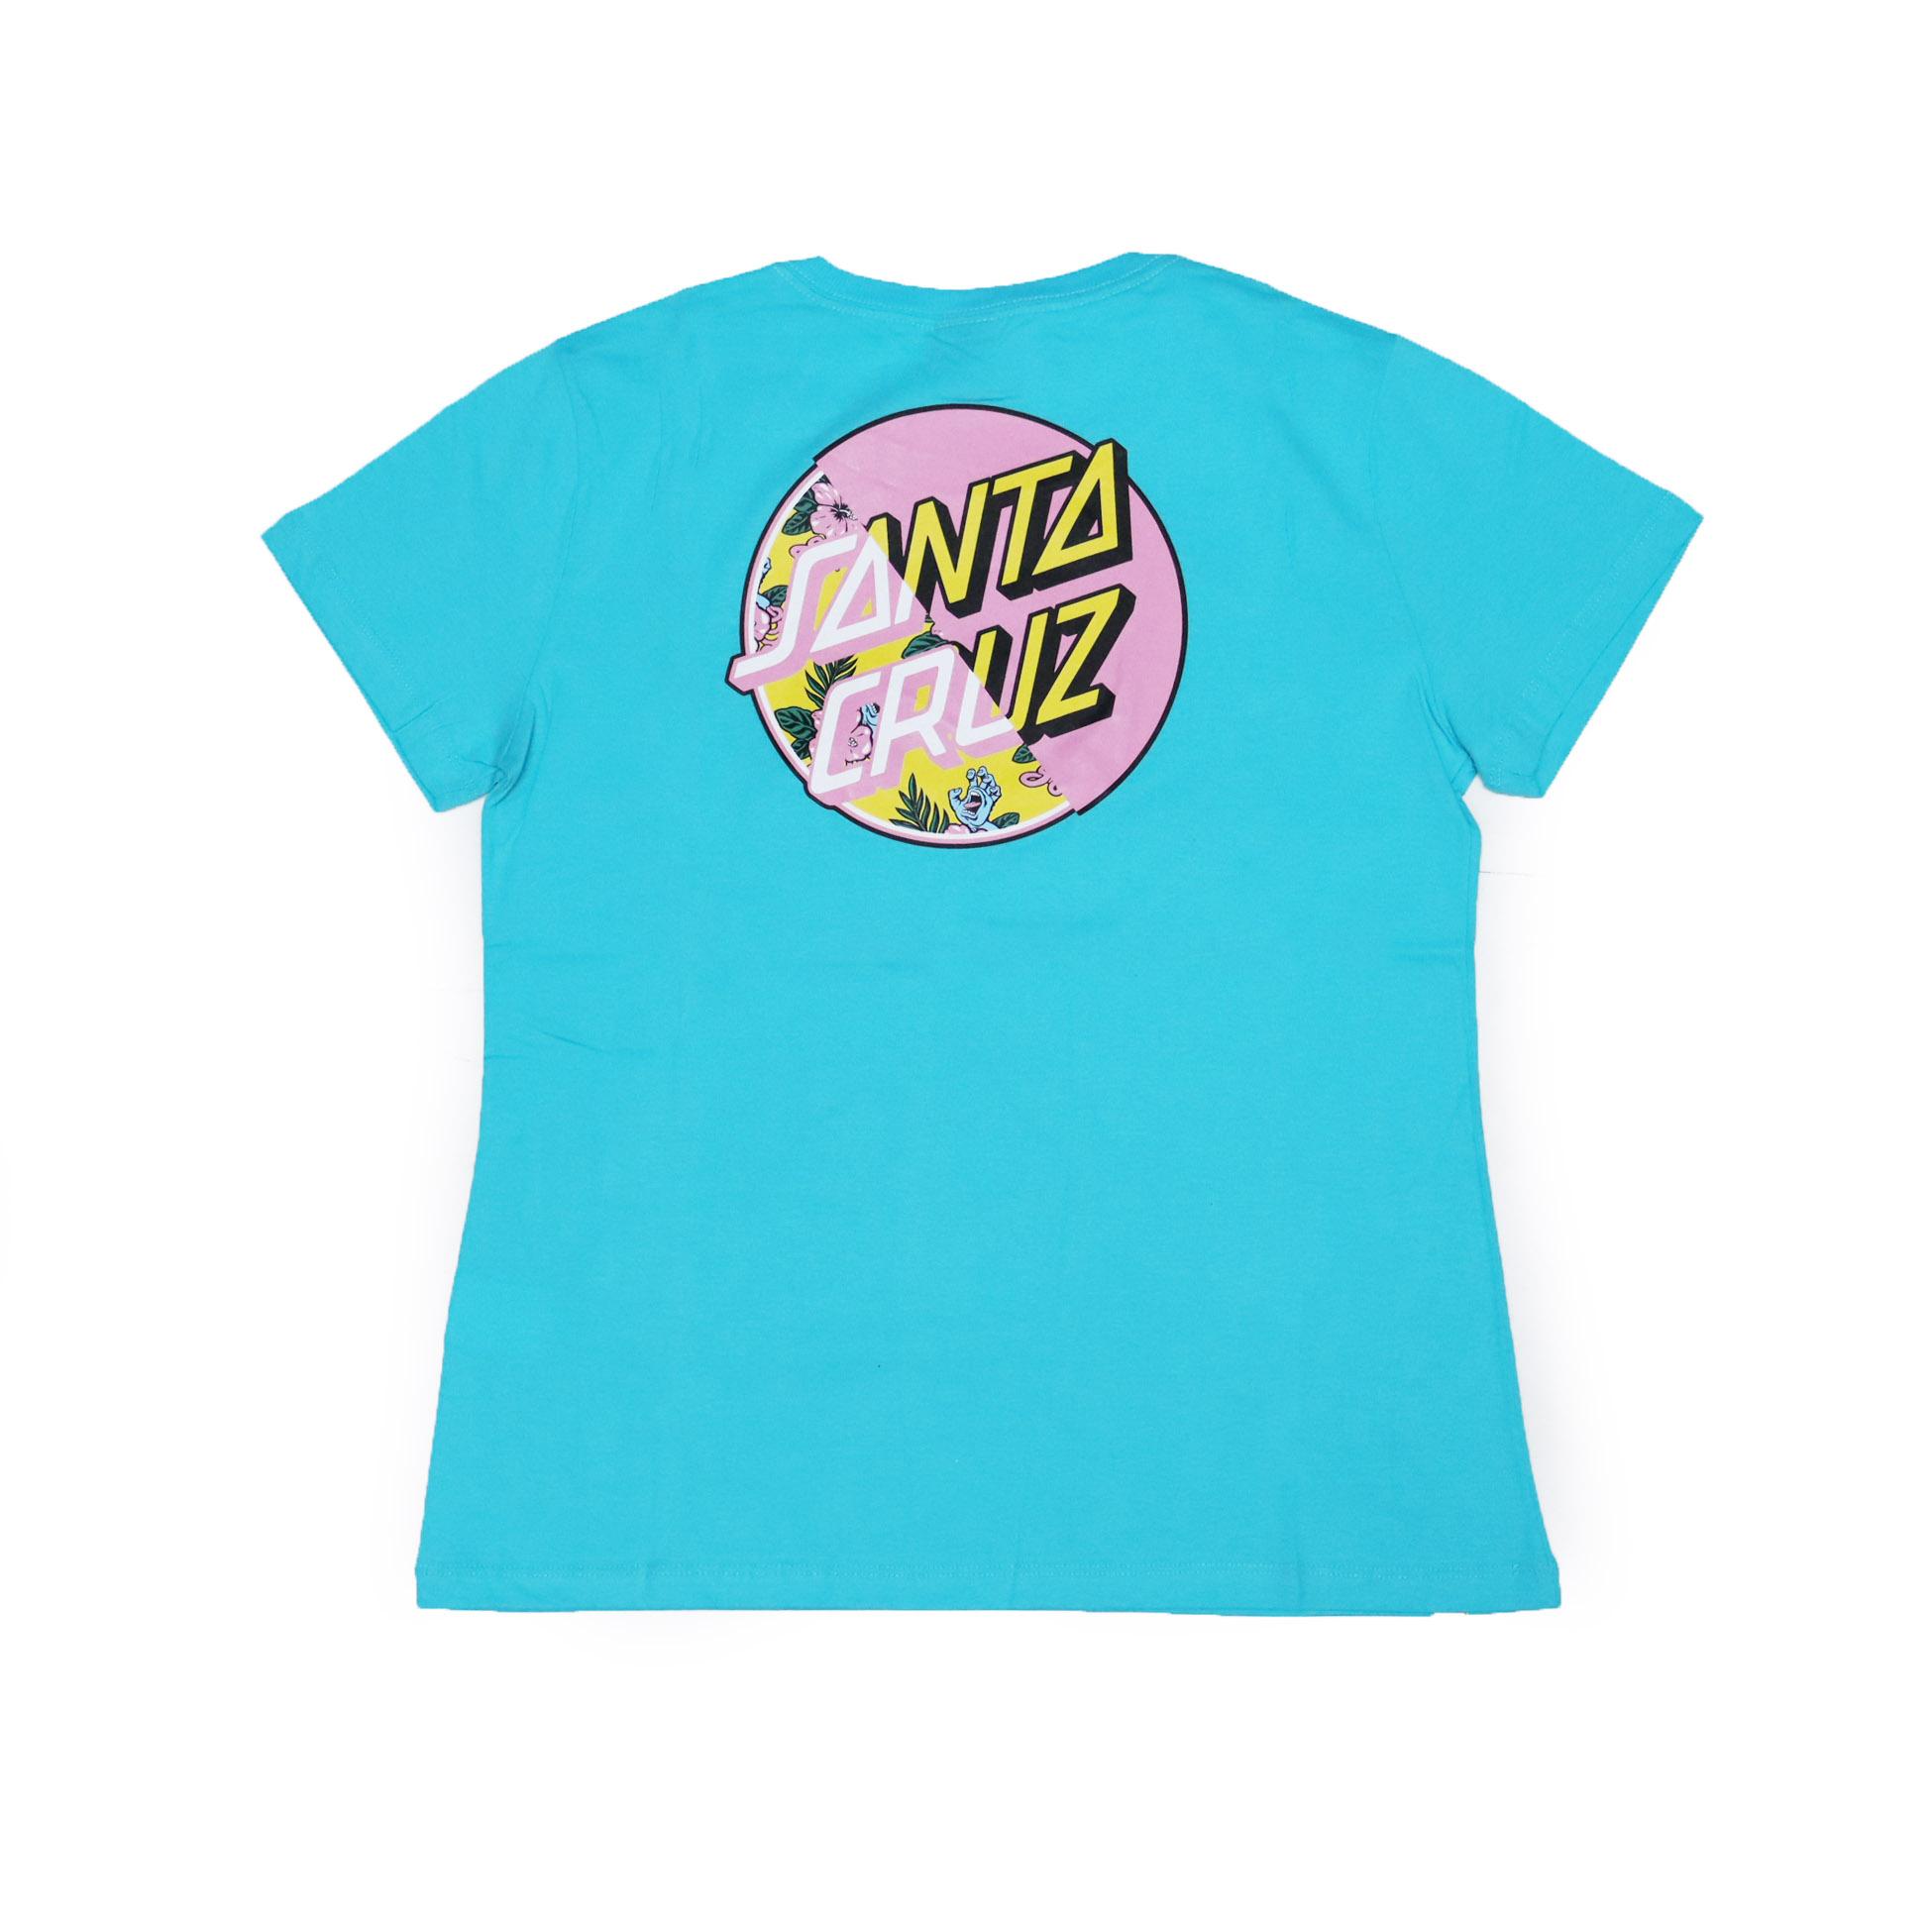 Camiseta Feminina Santa Cruz Vacation Other Splice - Azul Turquesa